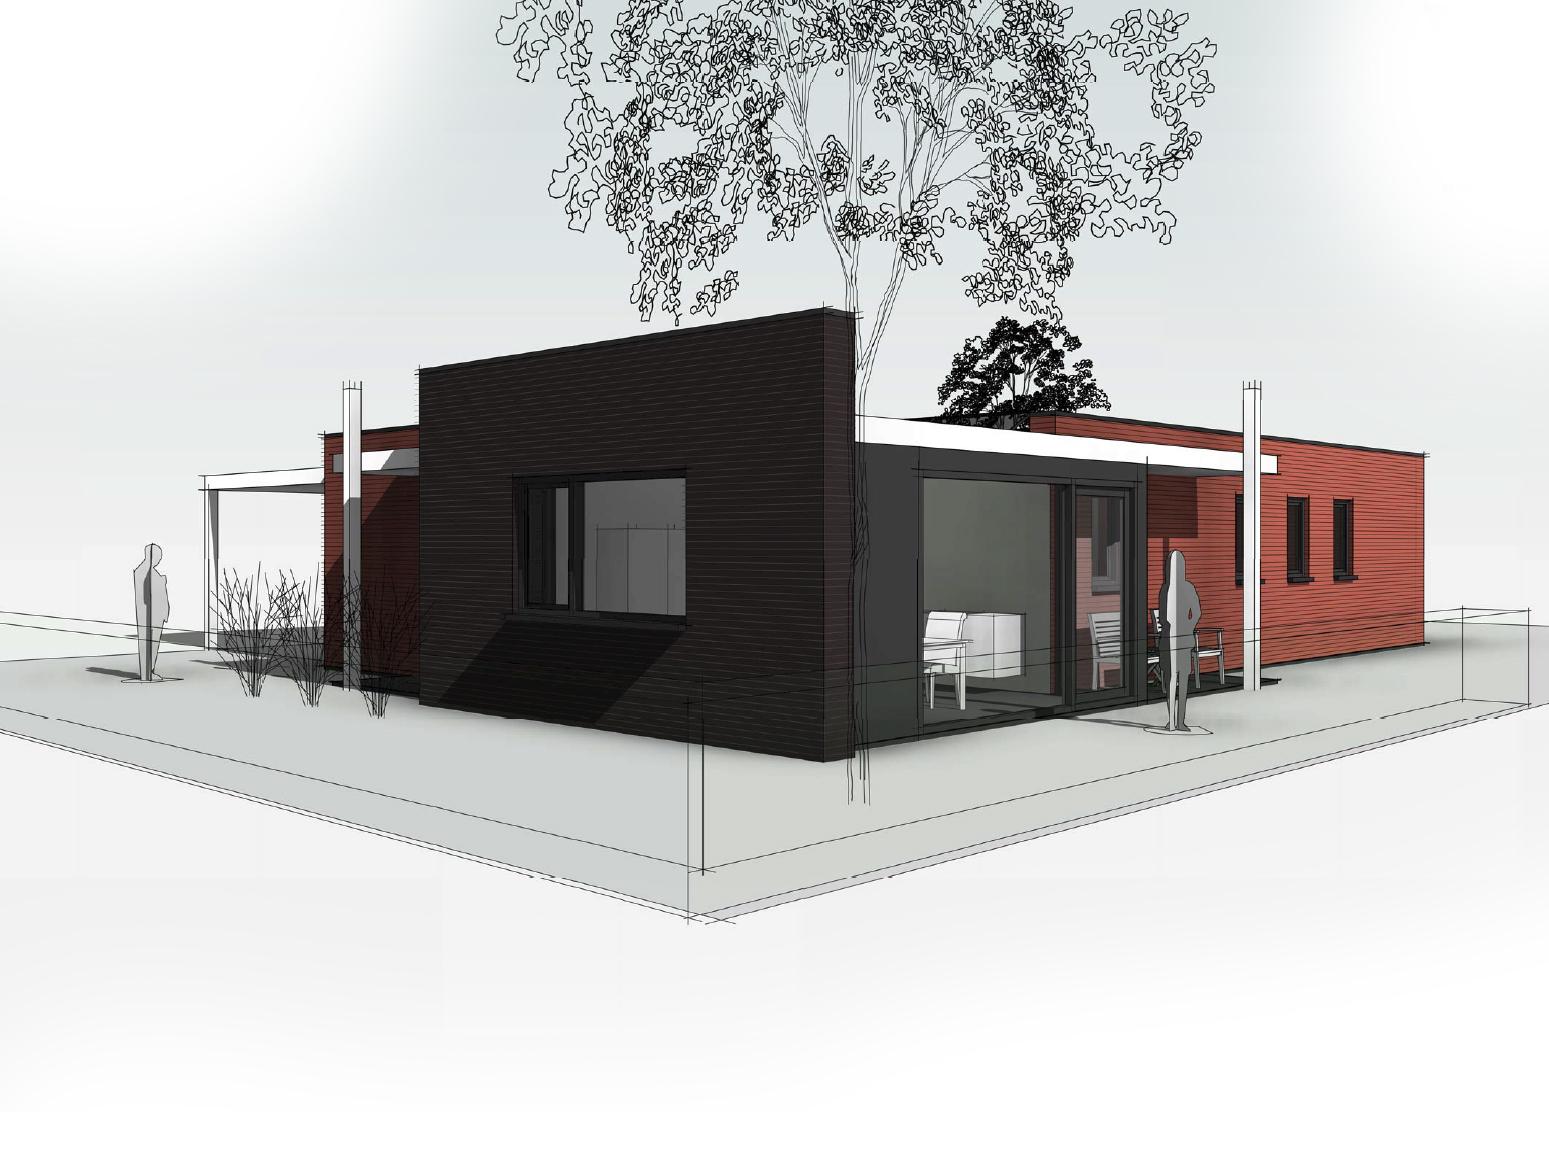 levensloopbestendigewoning-platdak-twello-van-oord-architectuur-en-design-wenum-wiesel-architect-voorst-architect-apeldoorn-2